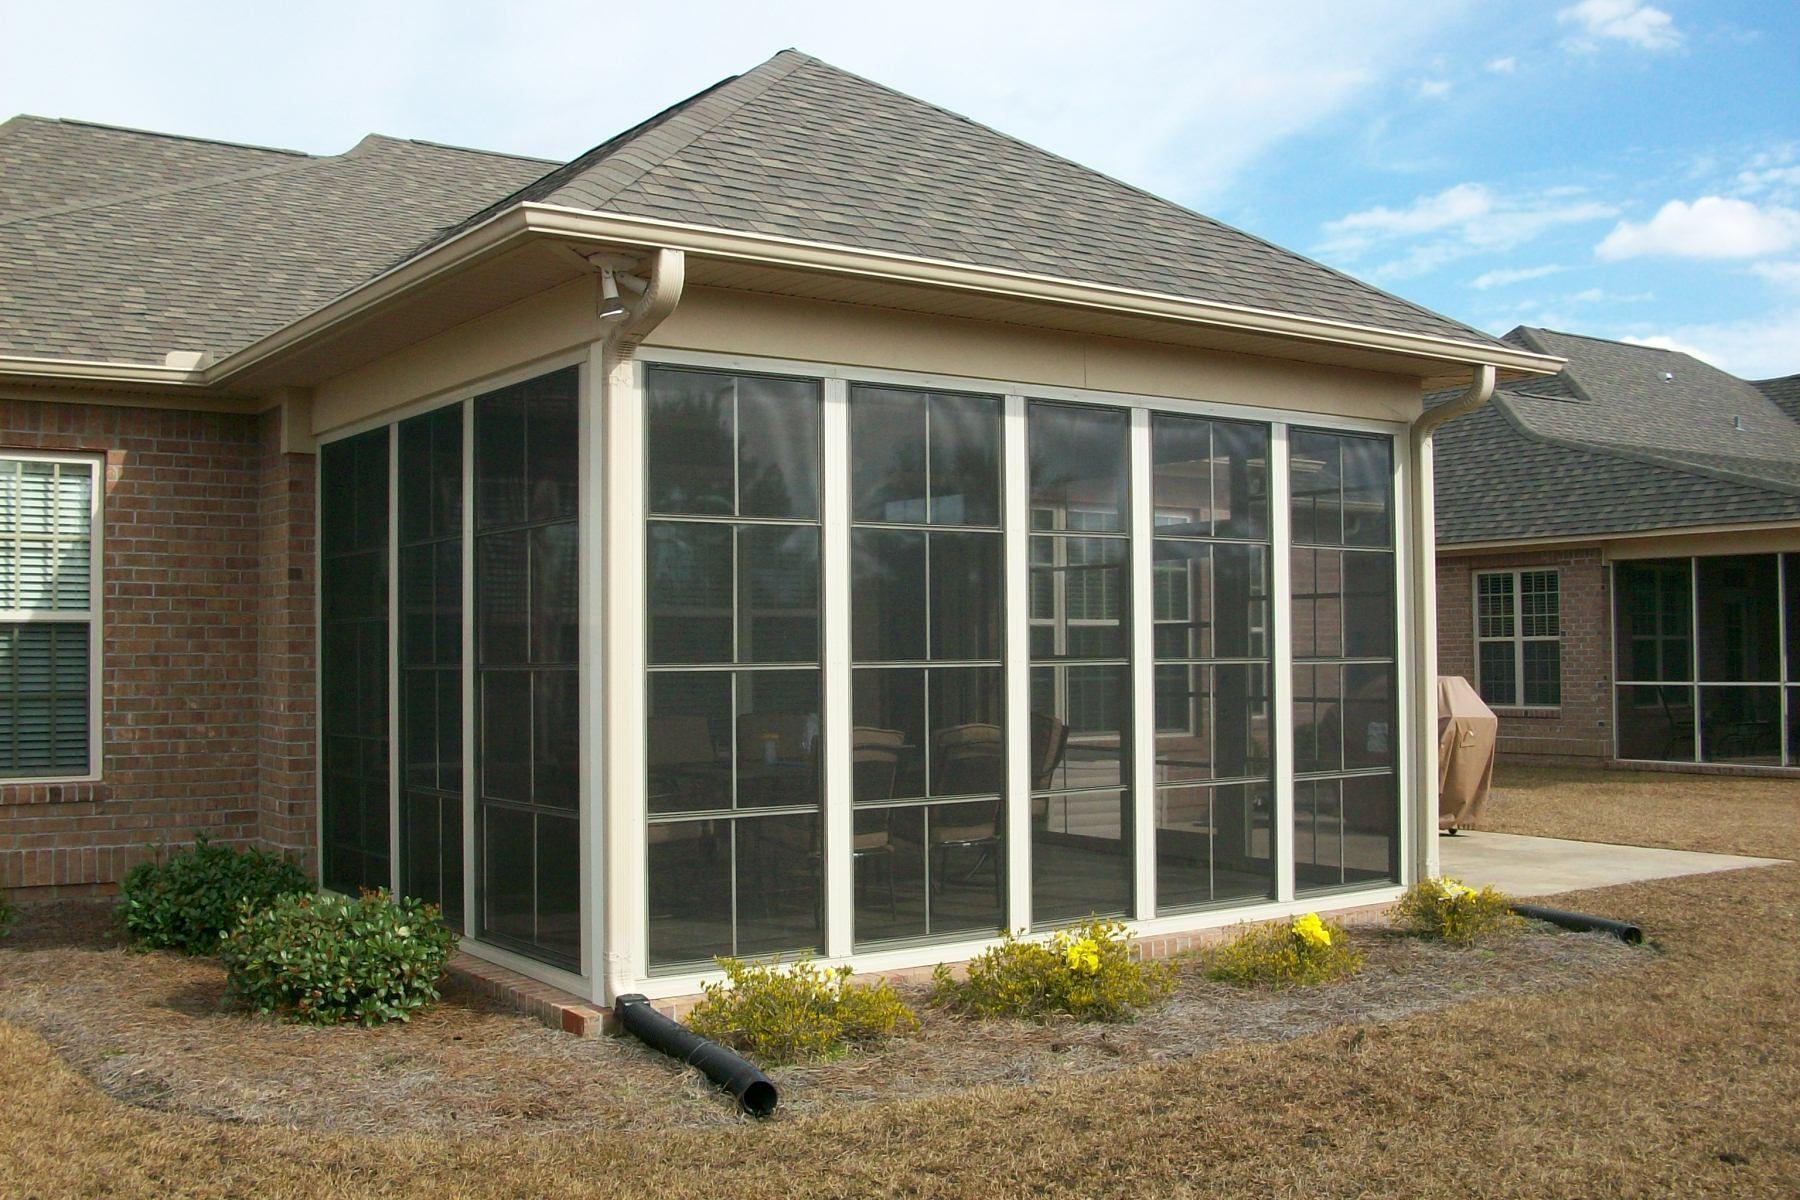 3 season porch window ideas  sunrooms  sunrooms wilmington  sunrooms  pinterest  sunrooms